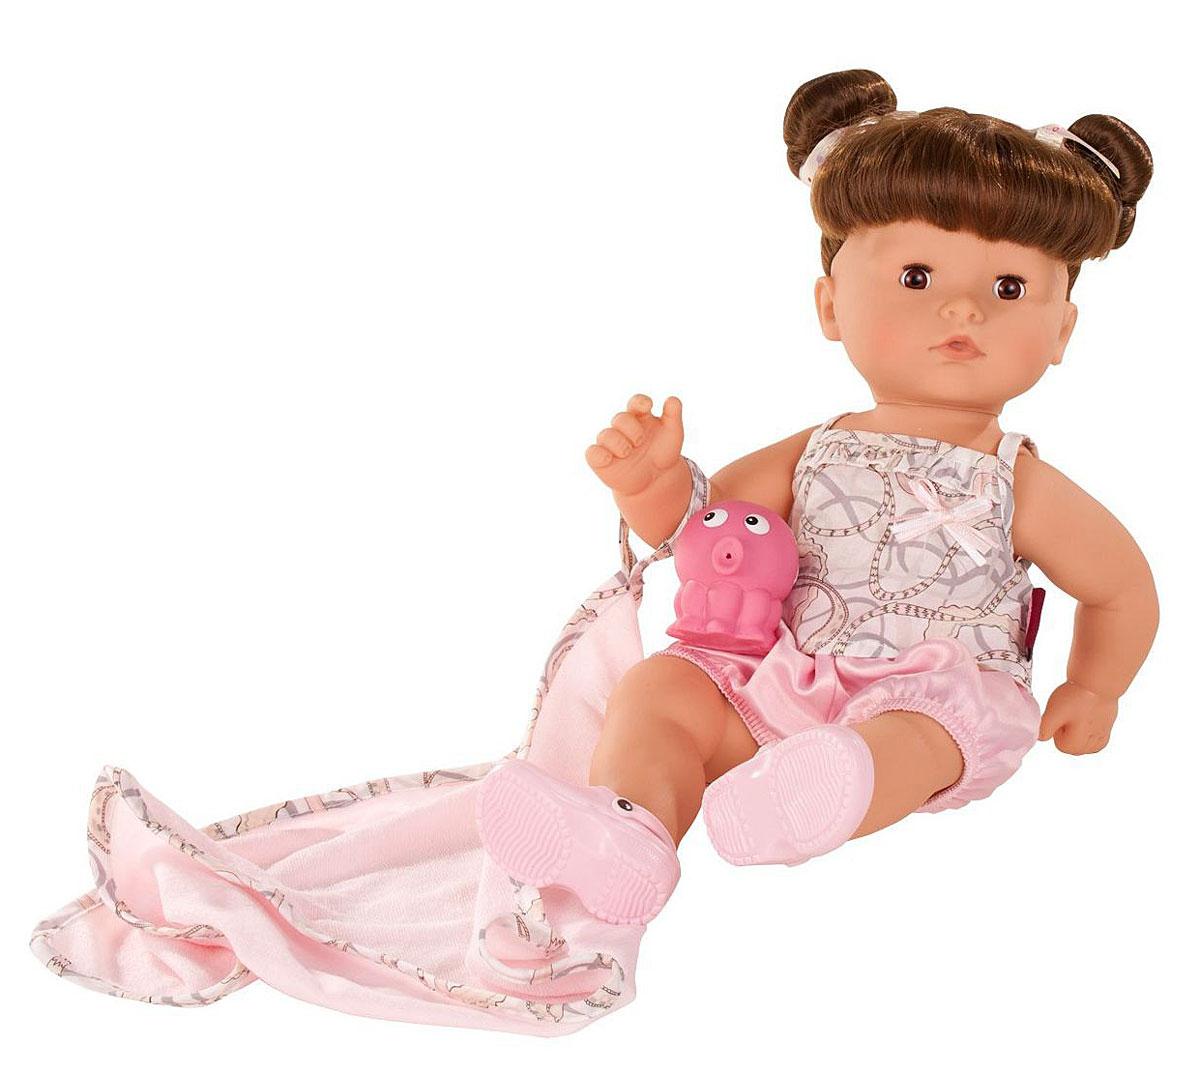 Gotz Кукла Аквини-макси шатенка с карими глазами в розовых шортах gotz пупс аквини мальчик